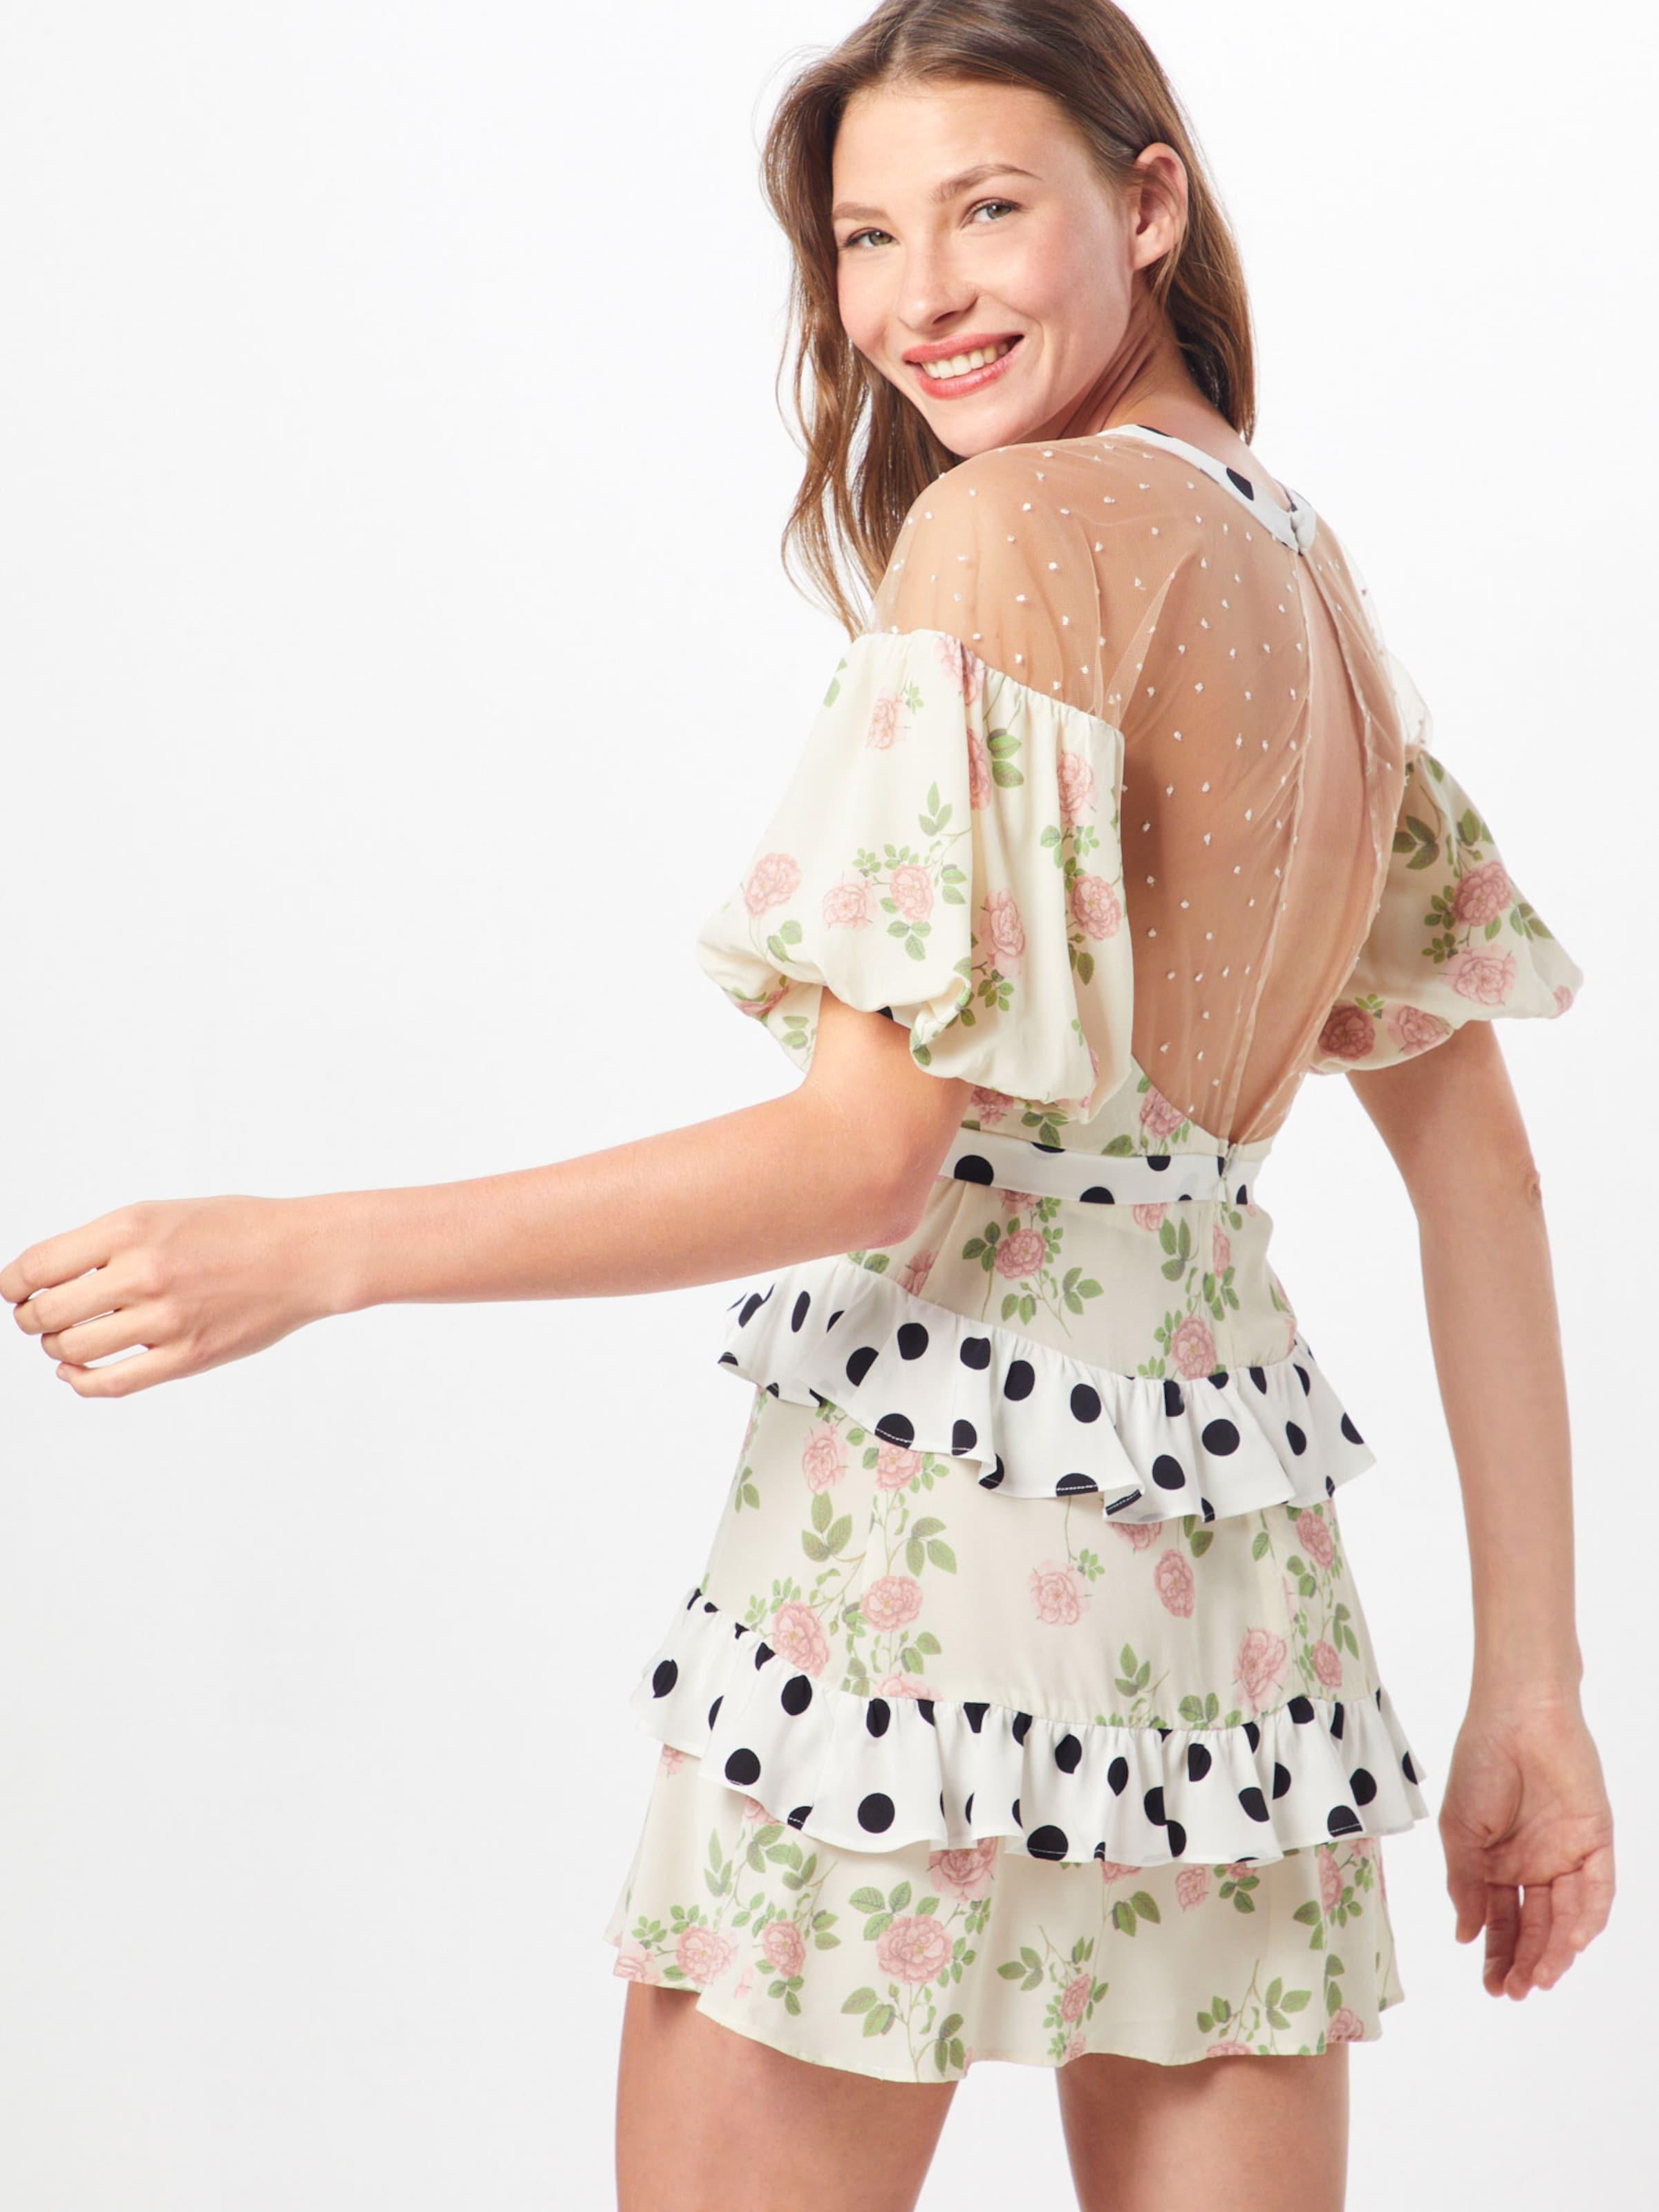 Loveamp; In 'butterscotch' Kleid BeigeMischfarben Lemons For nOP0kw